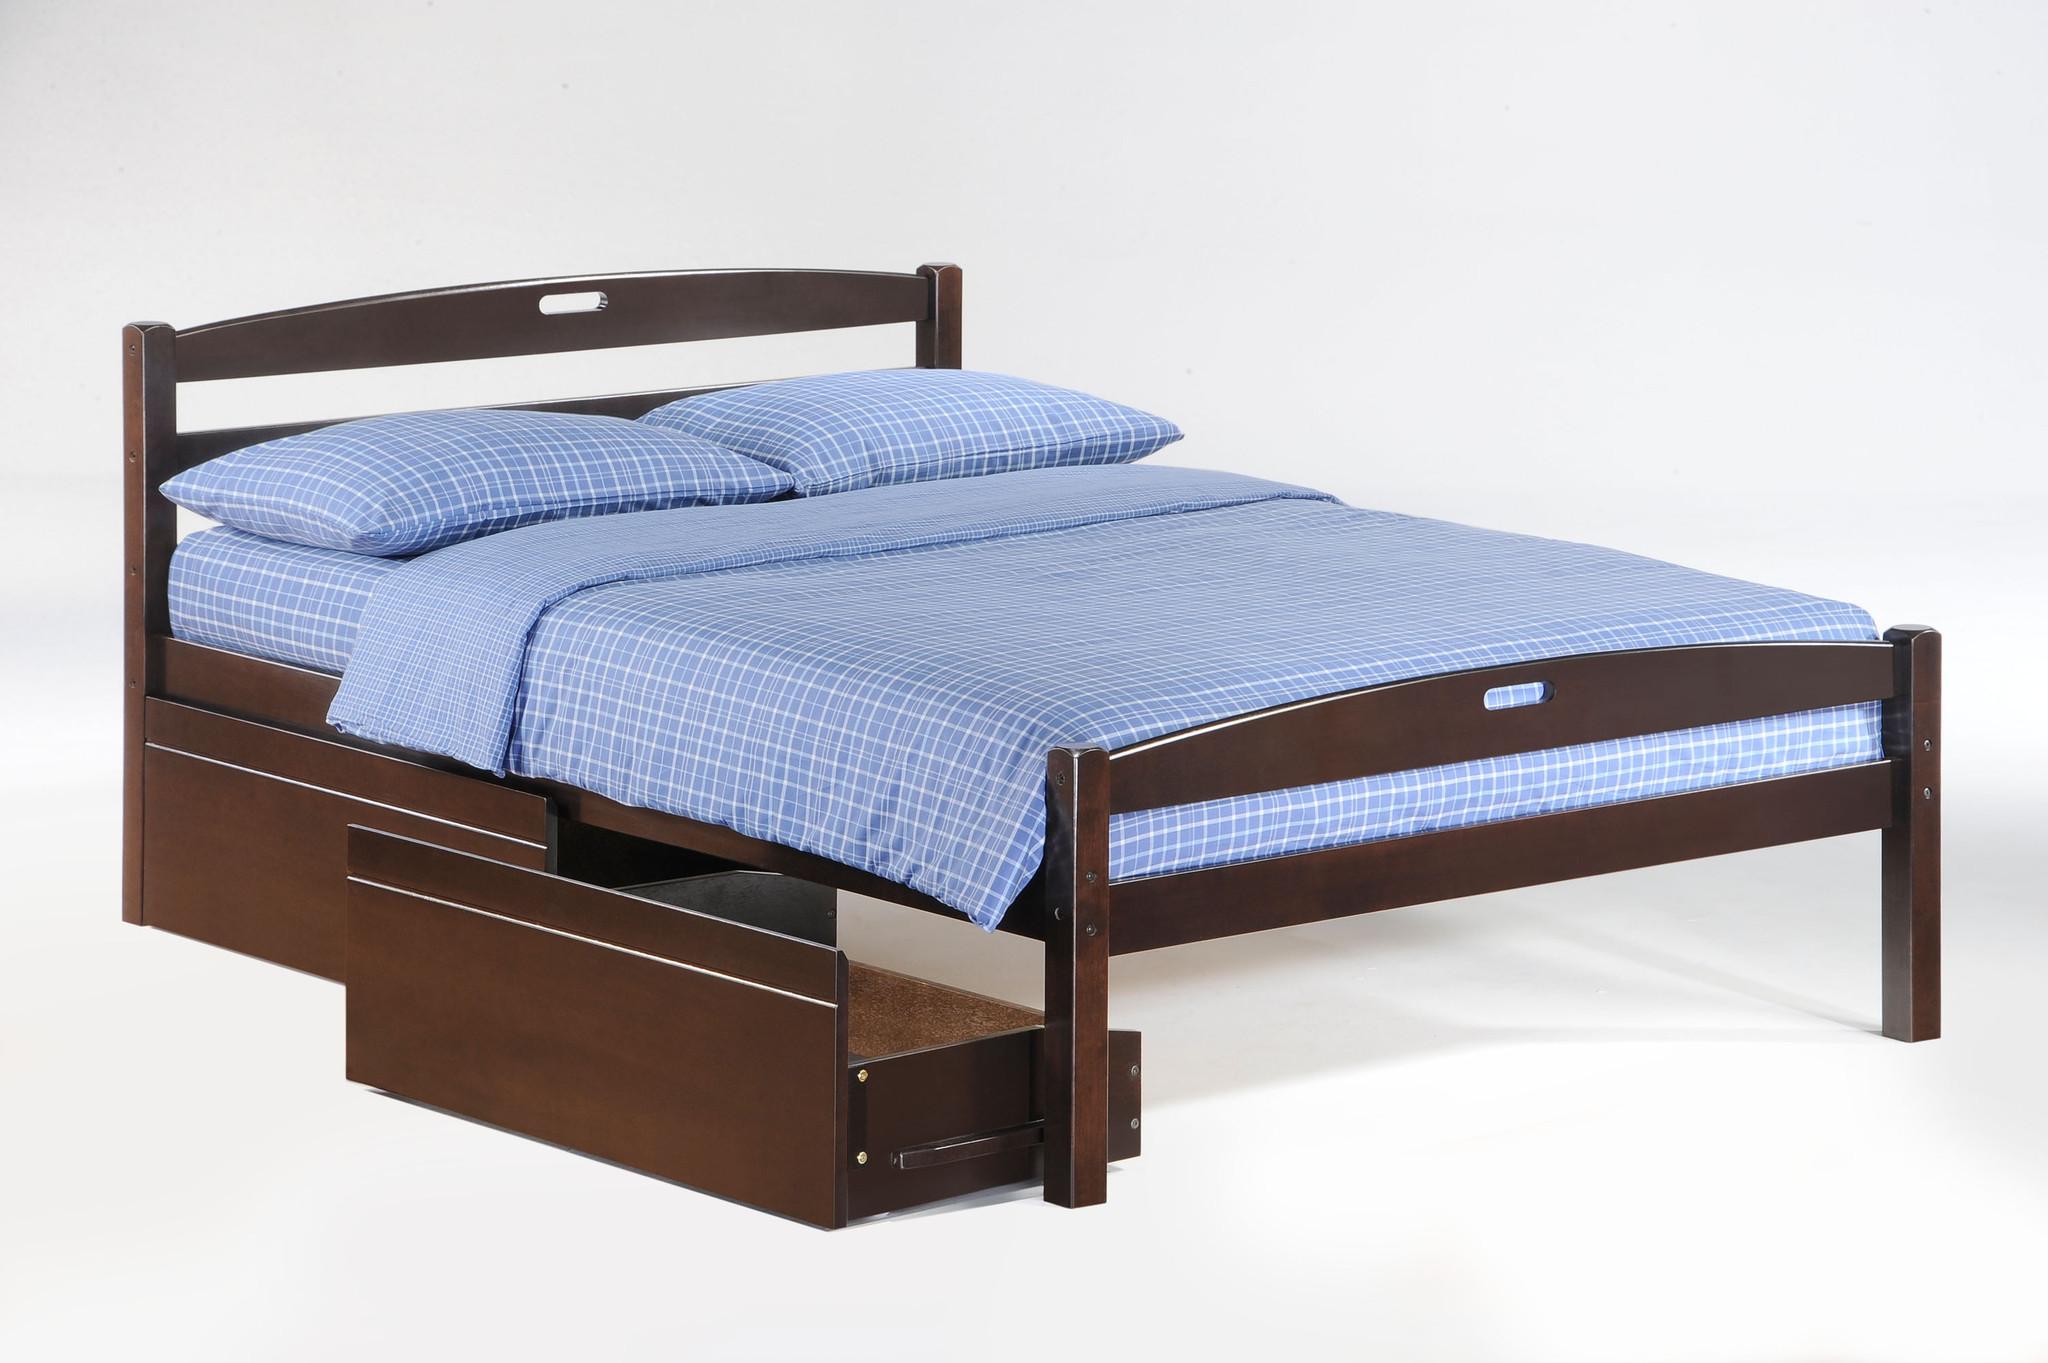 Traditional Mattress Vs Memory Foam Night-_-Day-Sesame-Bed-Full-Dark-Chocolate-w-Drawer-opened.jpg